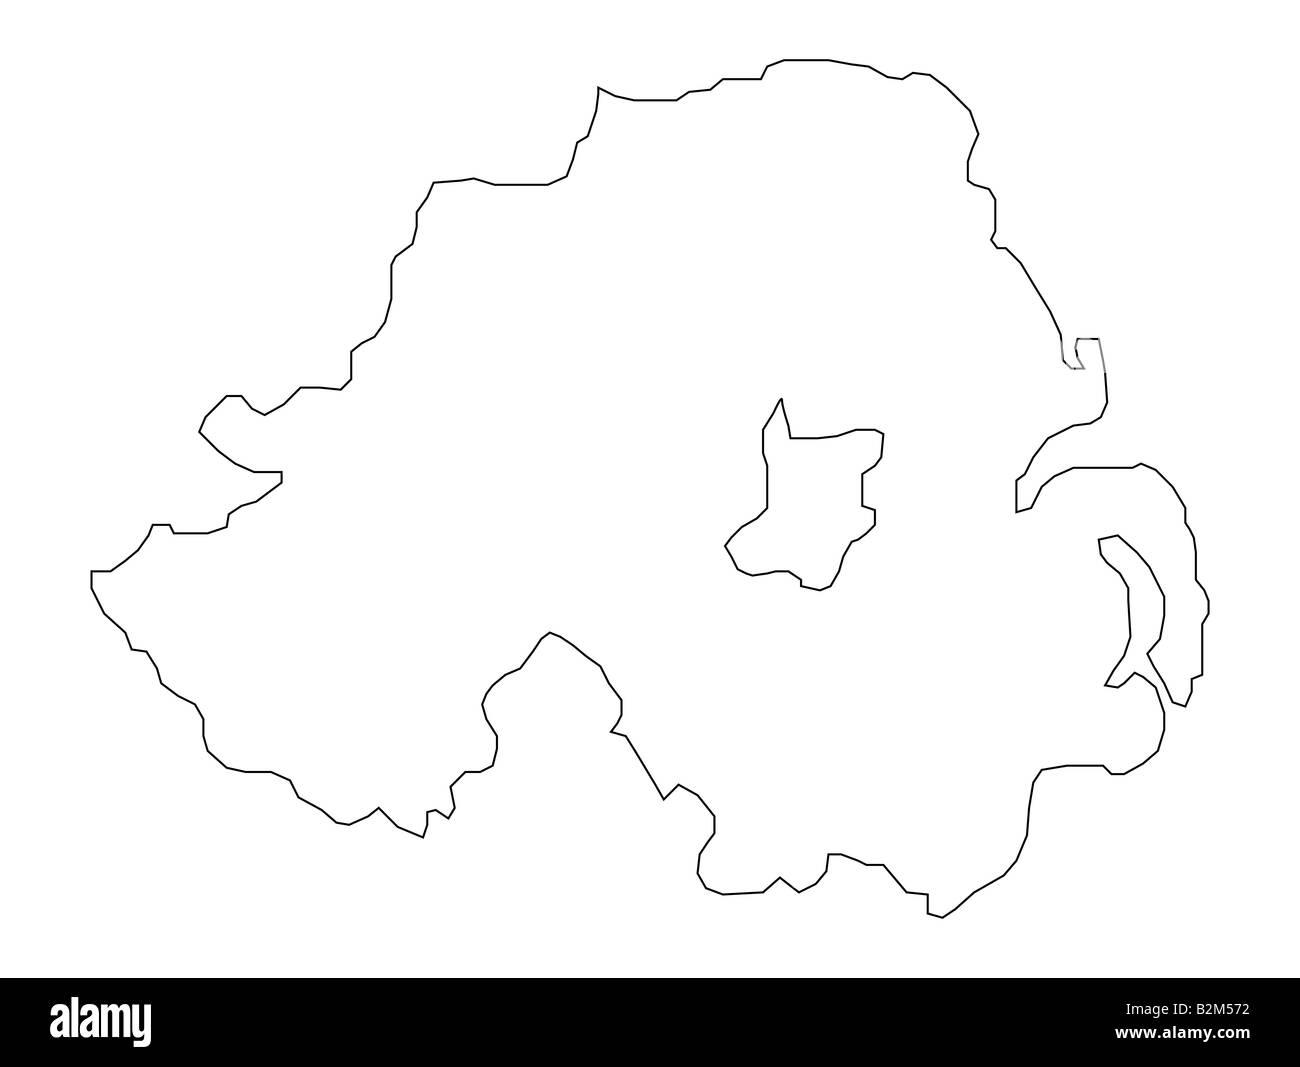 Map Of Ireland Black And White.Map Of Ireland Black And White Stock Photos Images Alamy